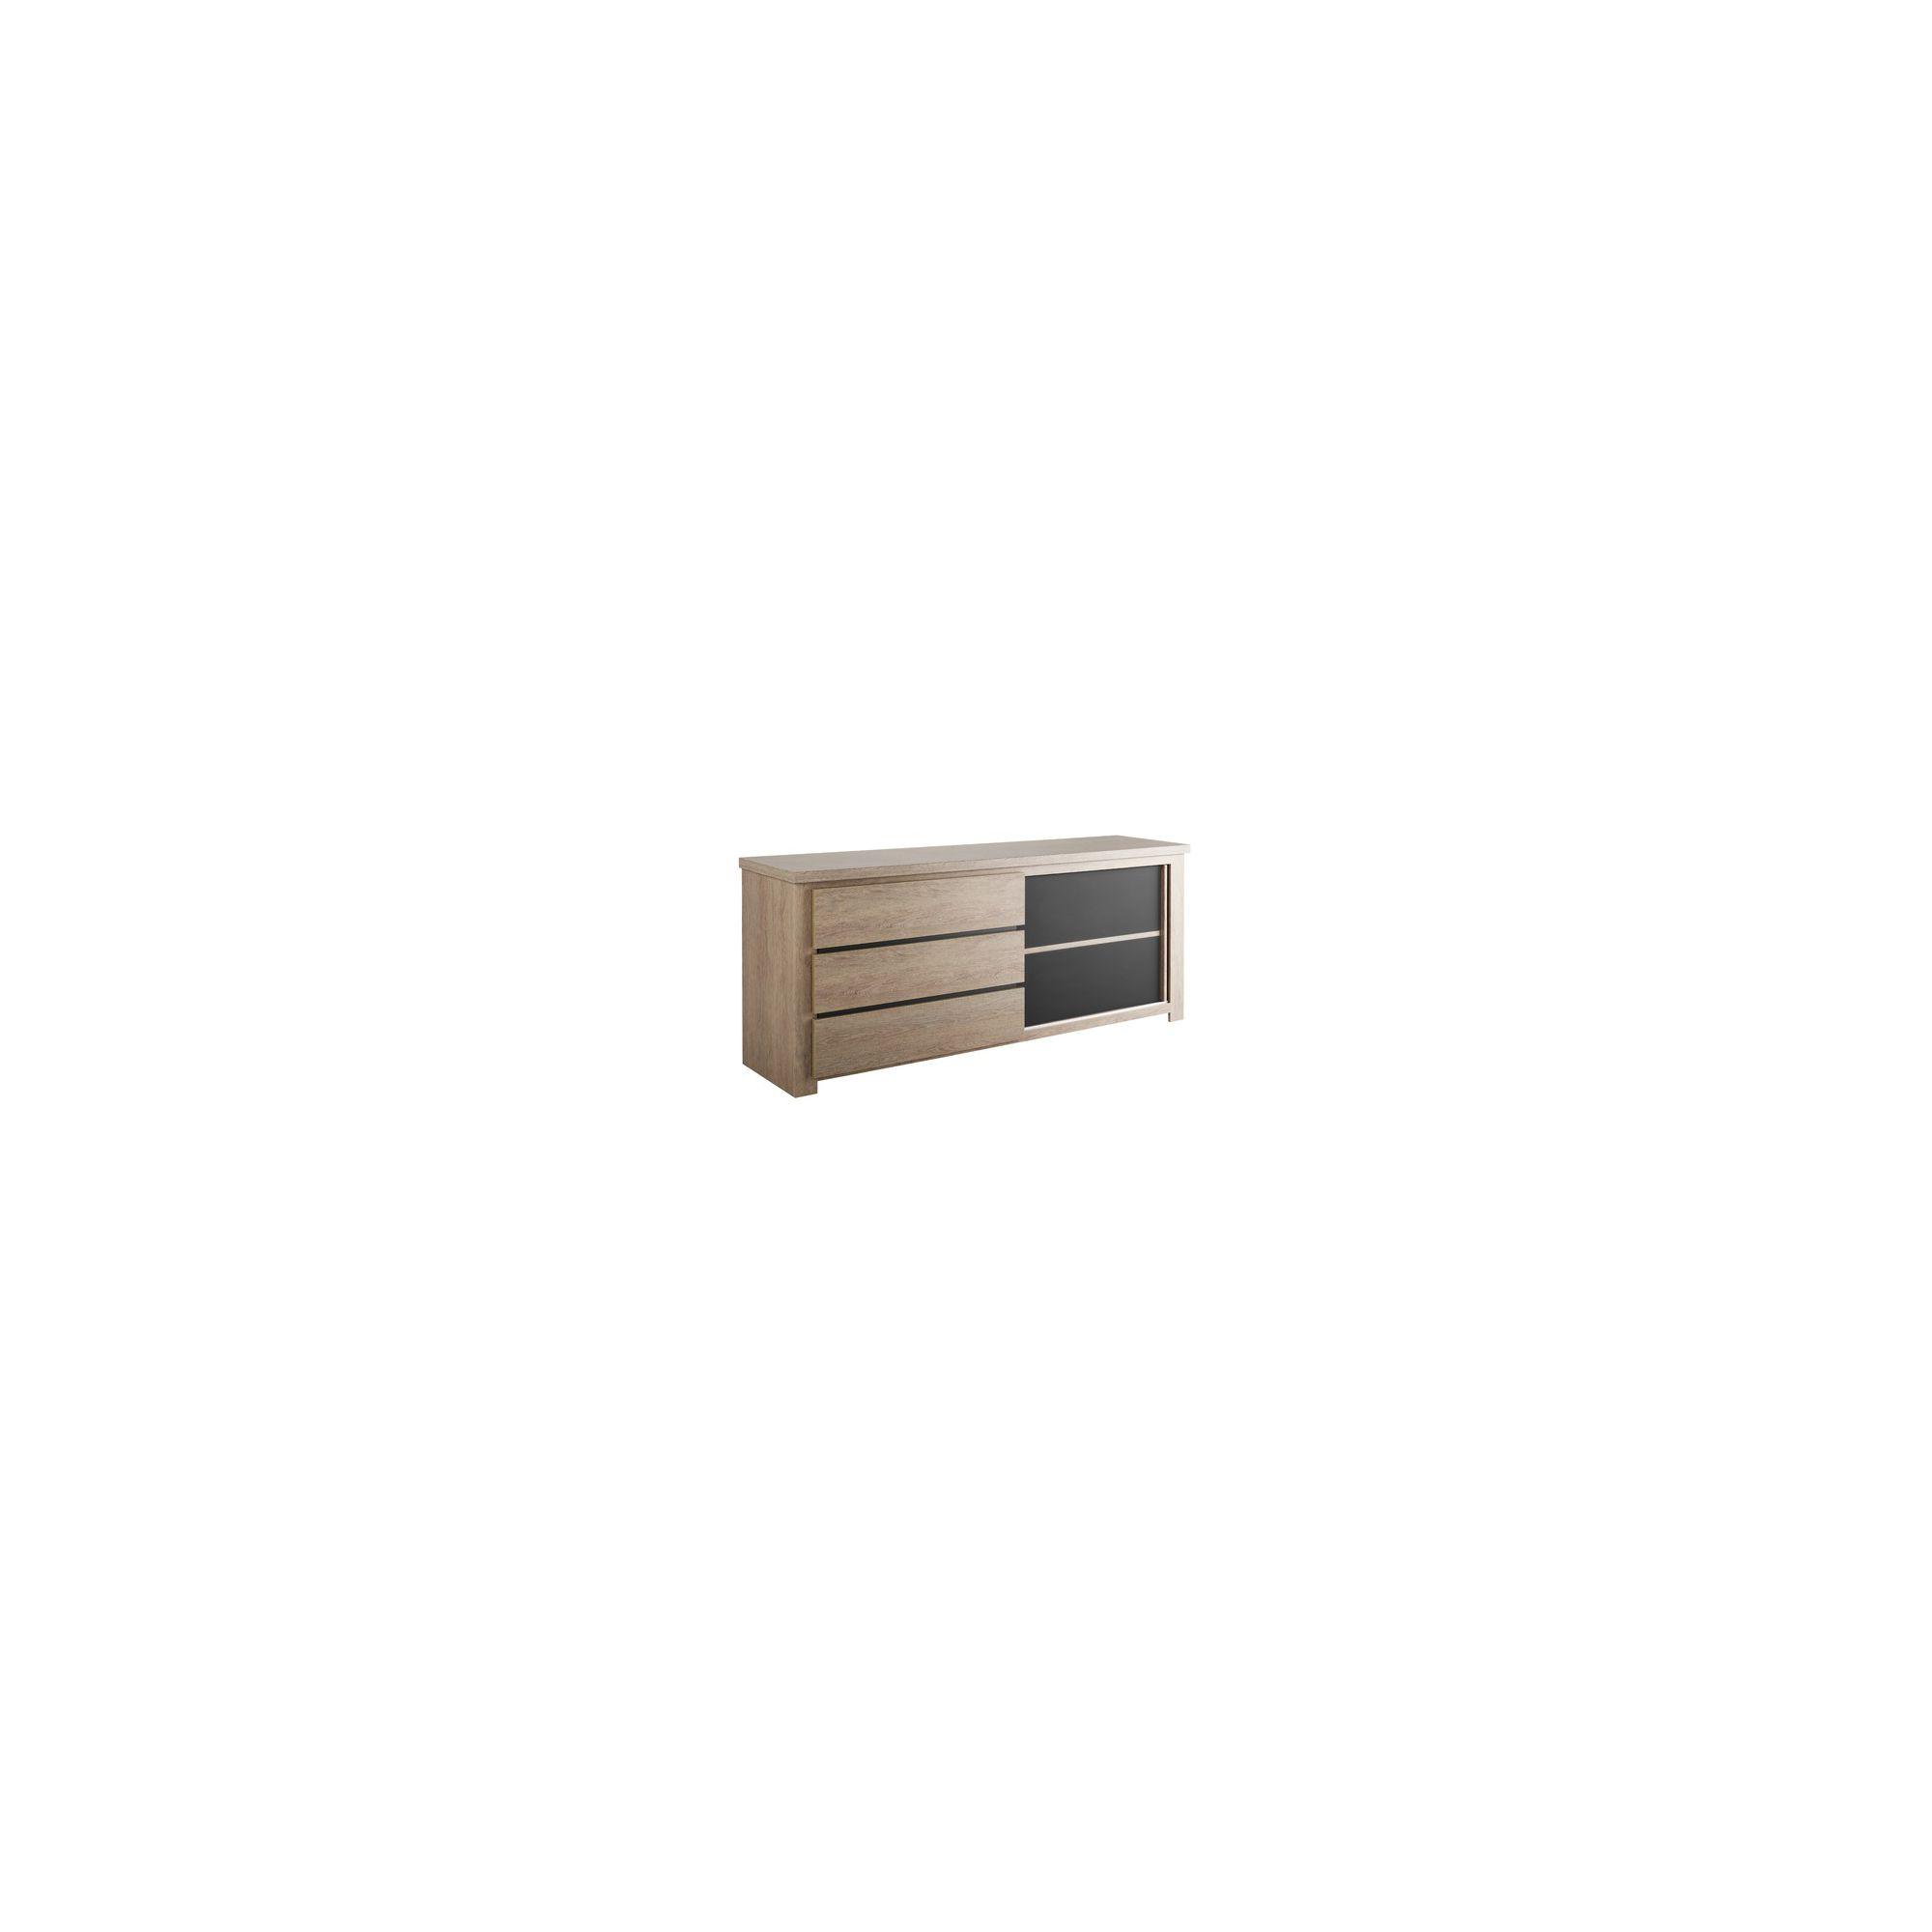 Parisot Tosca Sideboard in Ash Oak at Tesco Direct